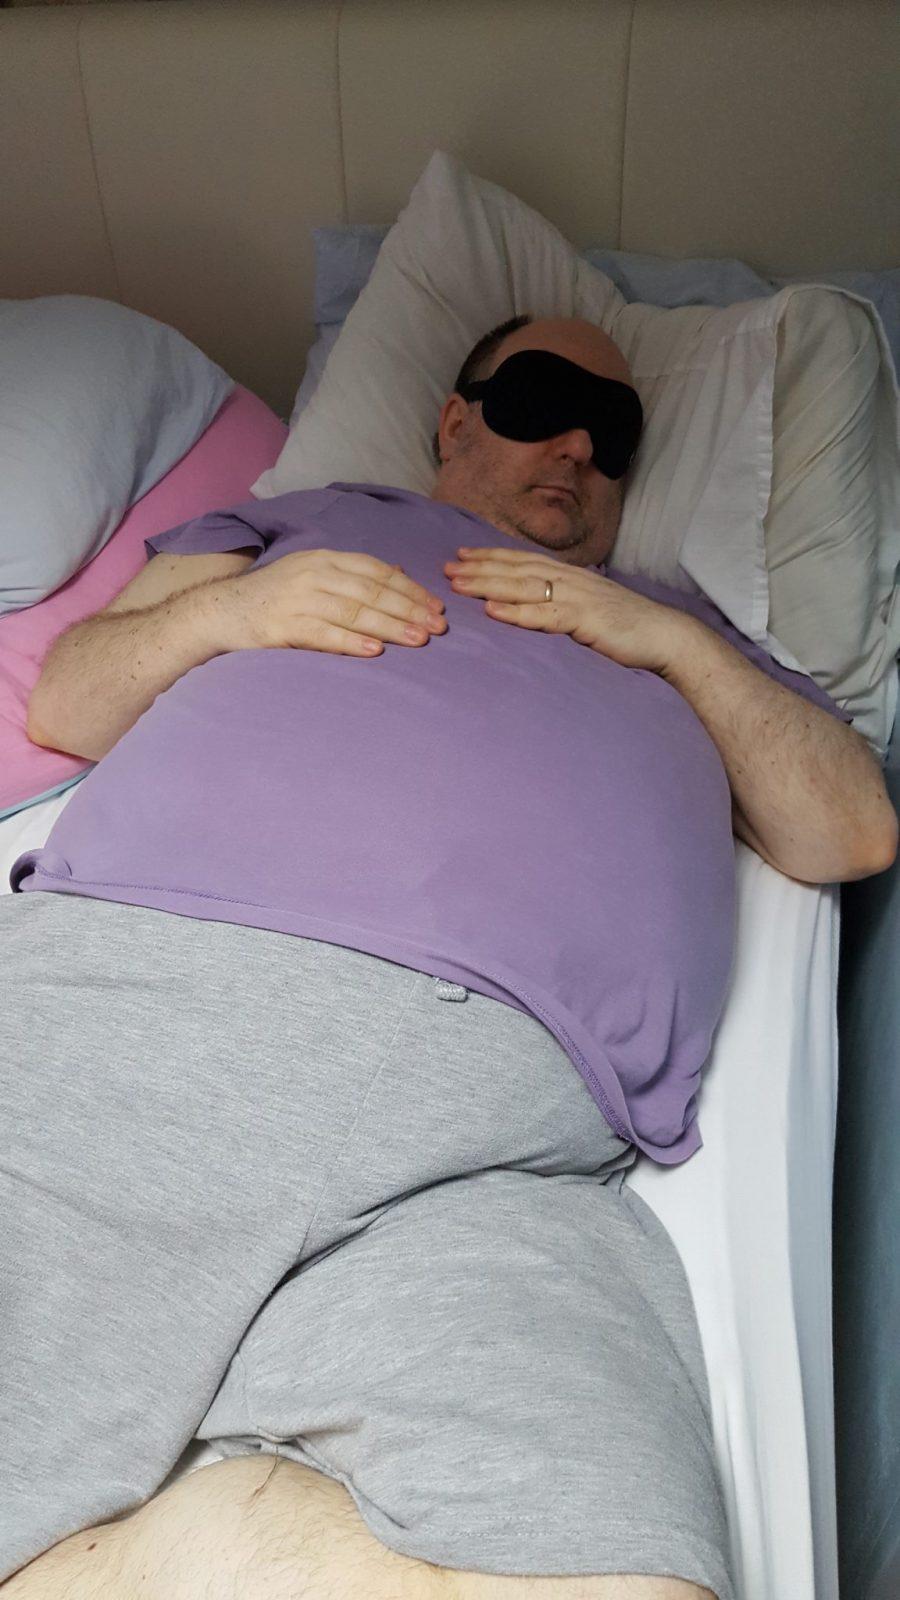 Michael asleep